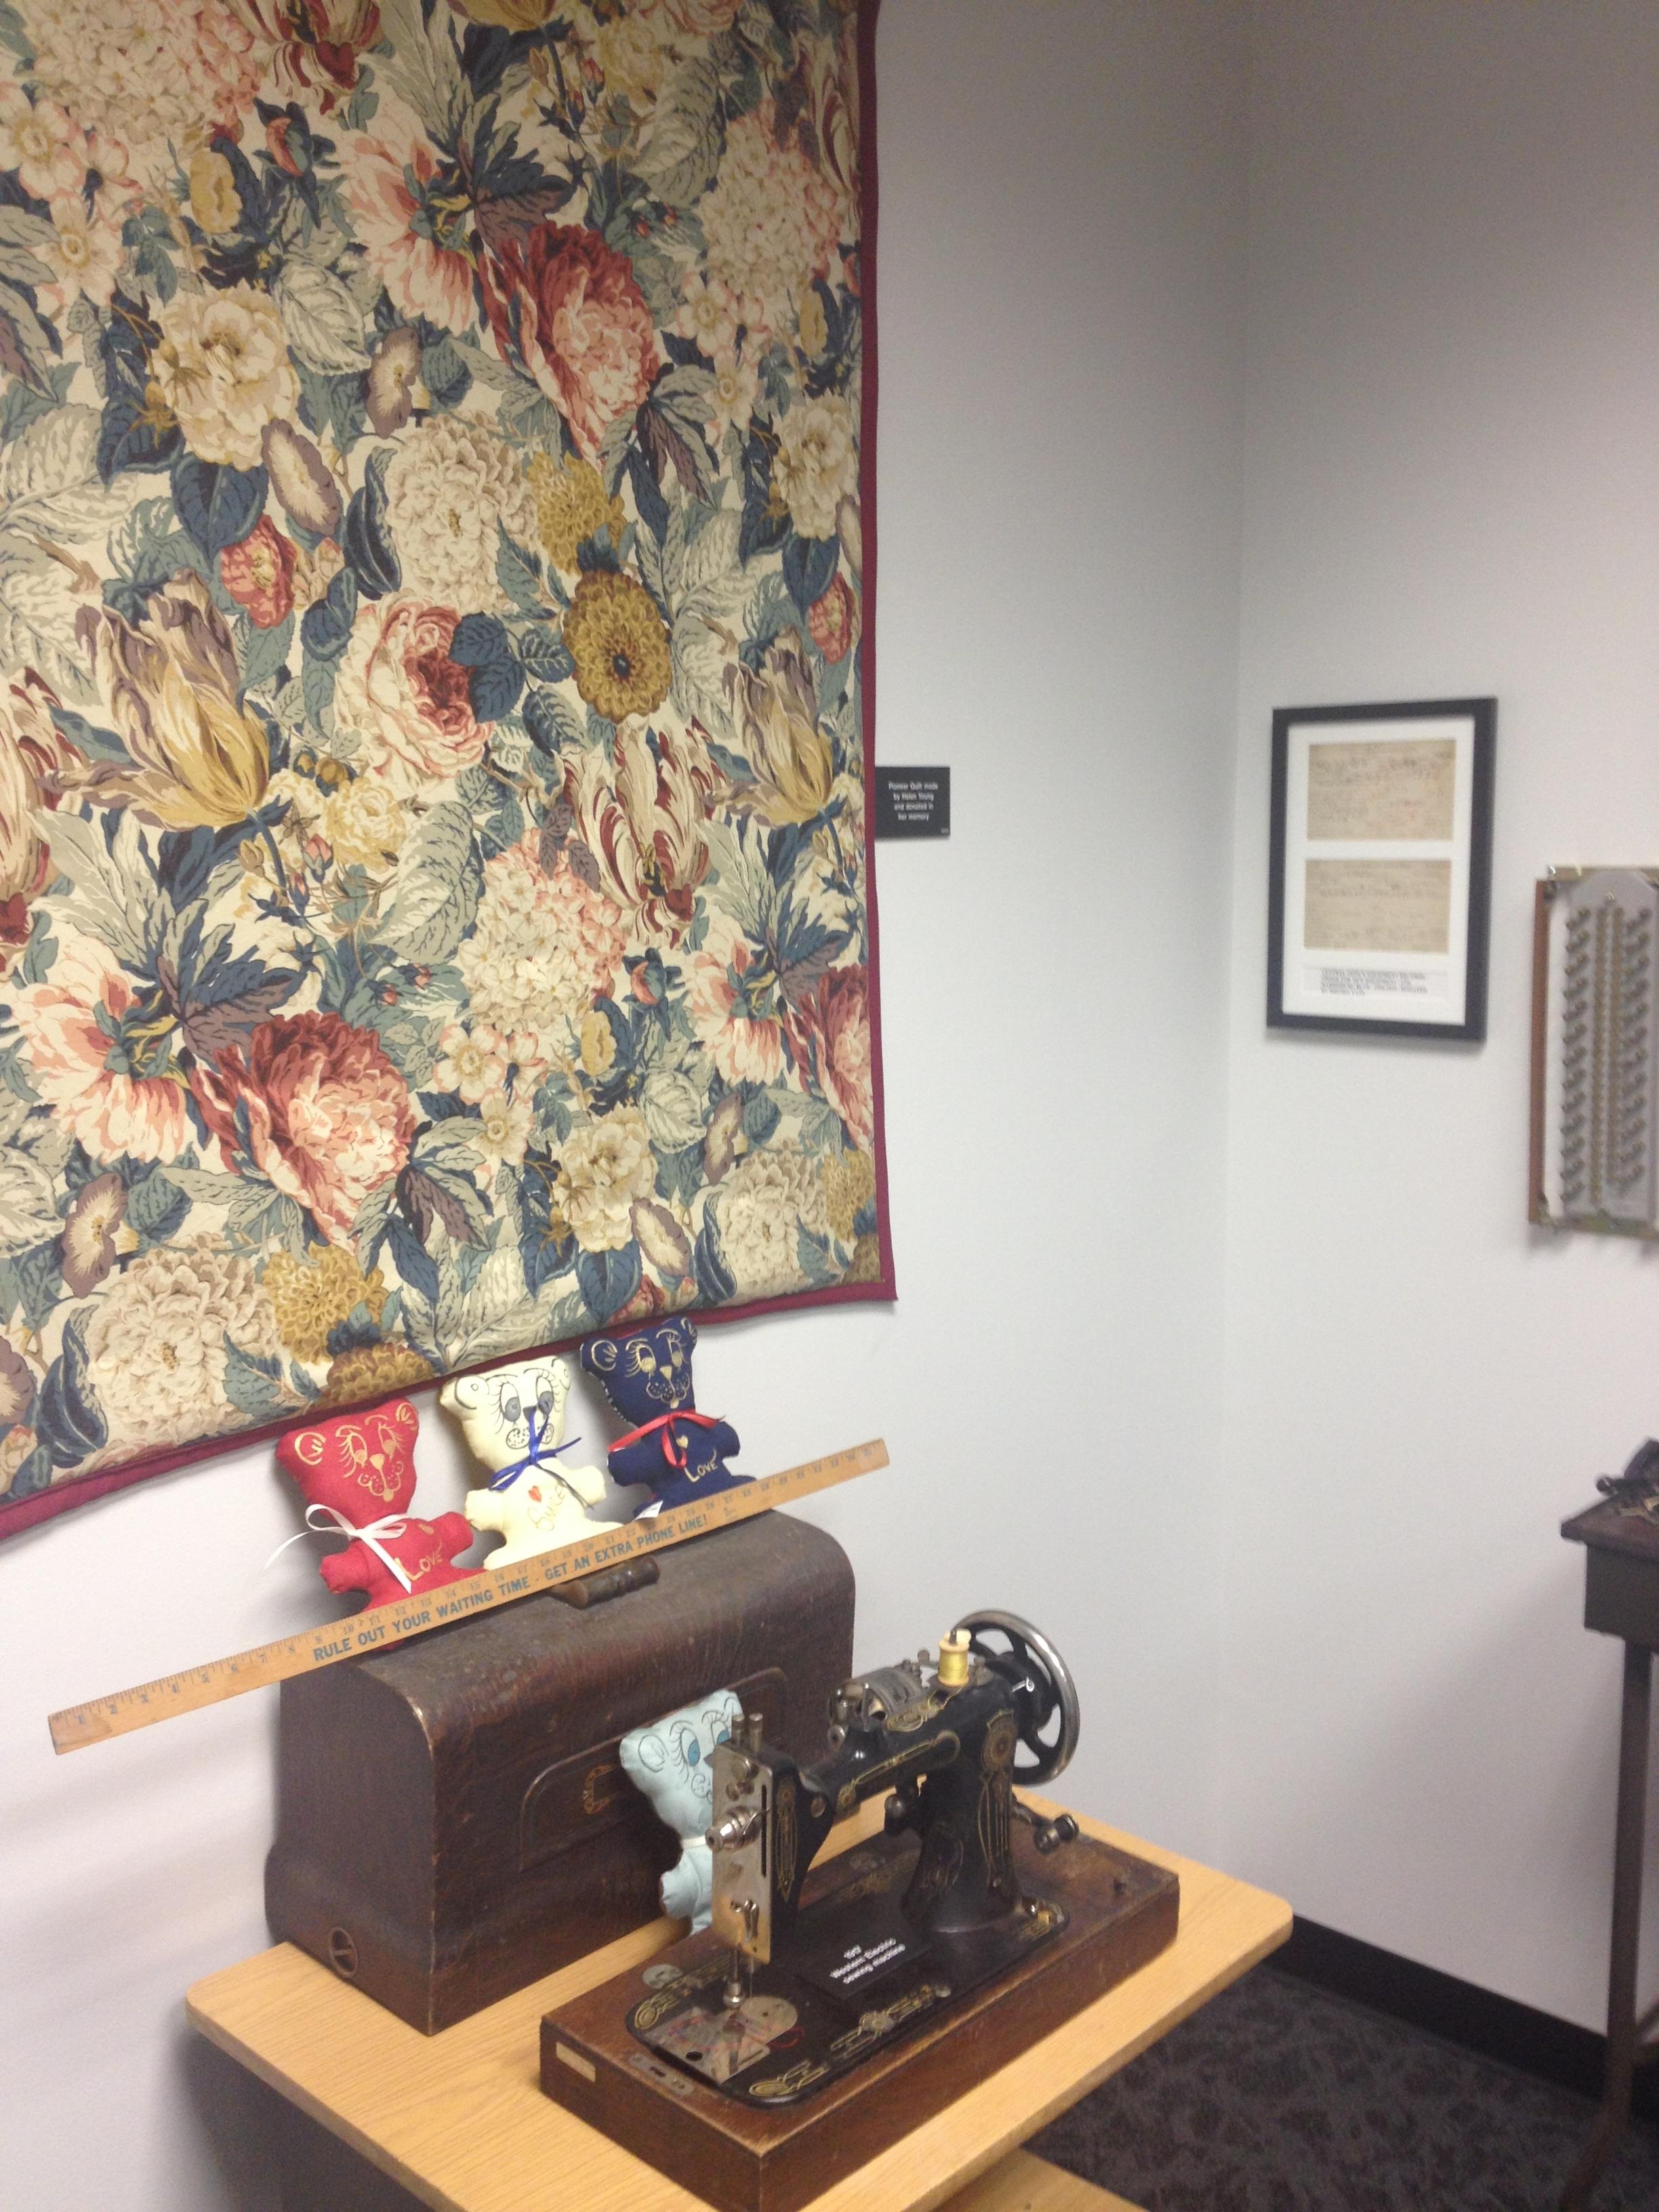 Telephone History Exhibit In Honor Of Doc Porter